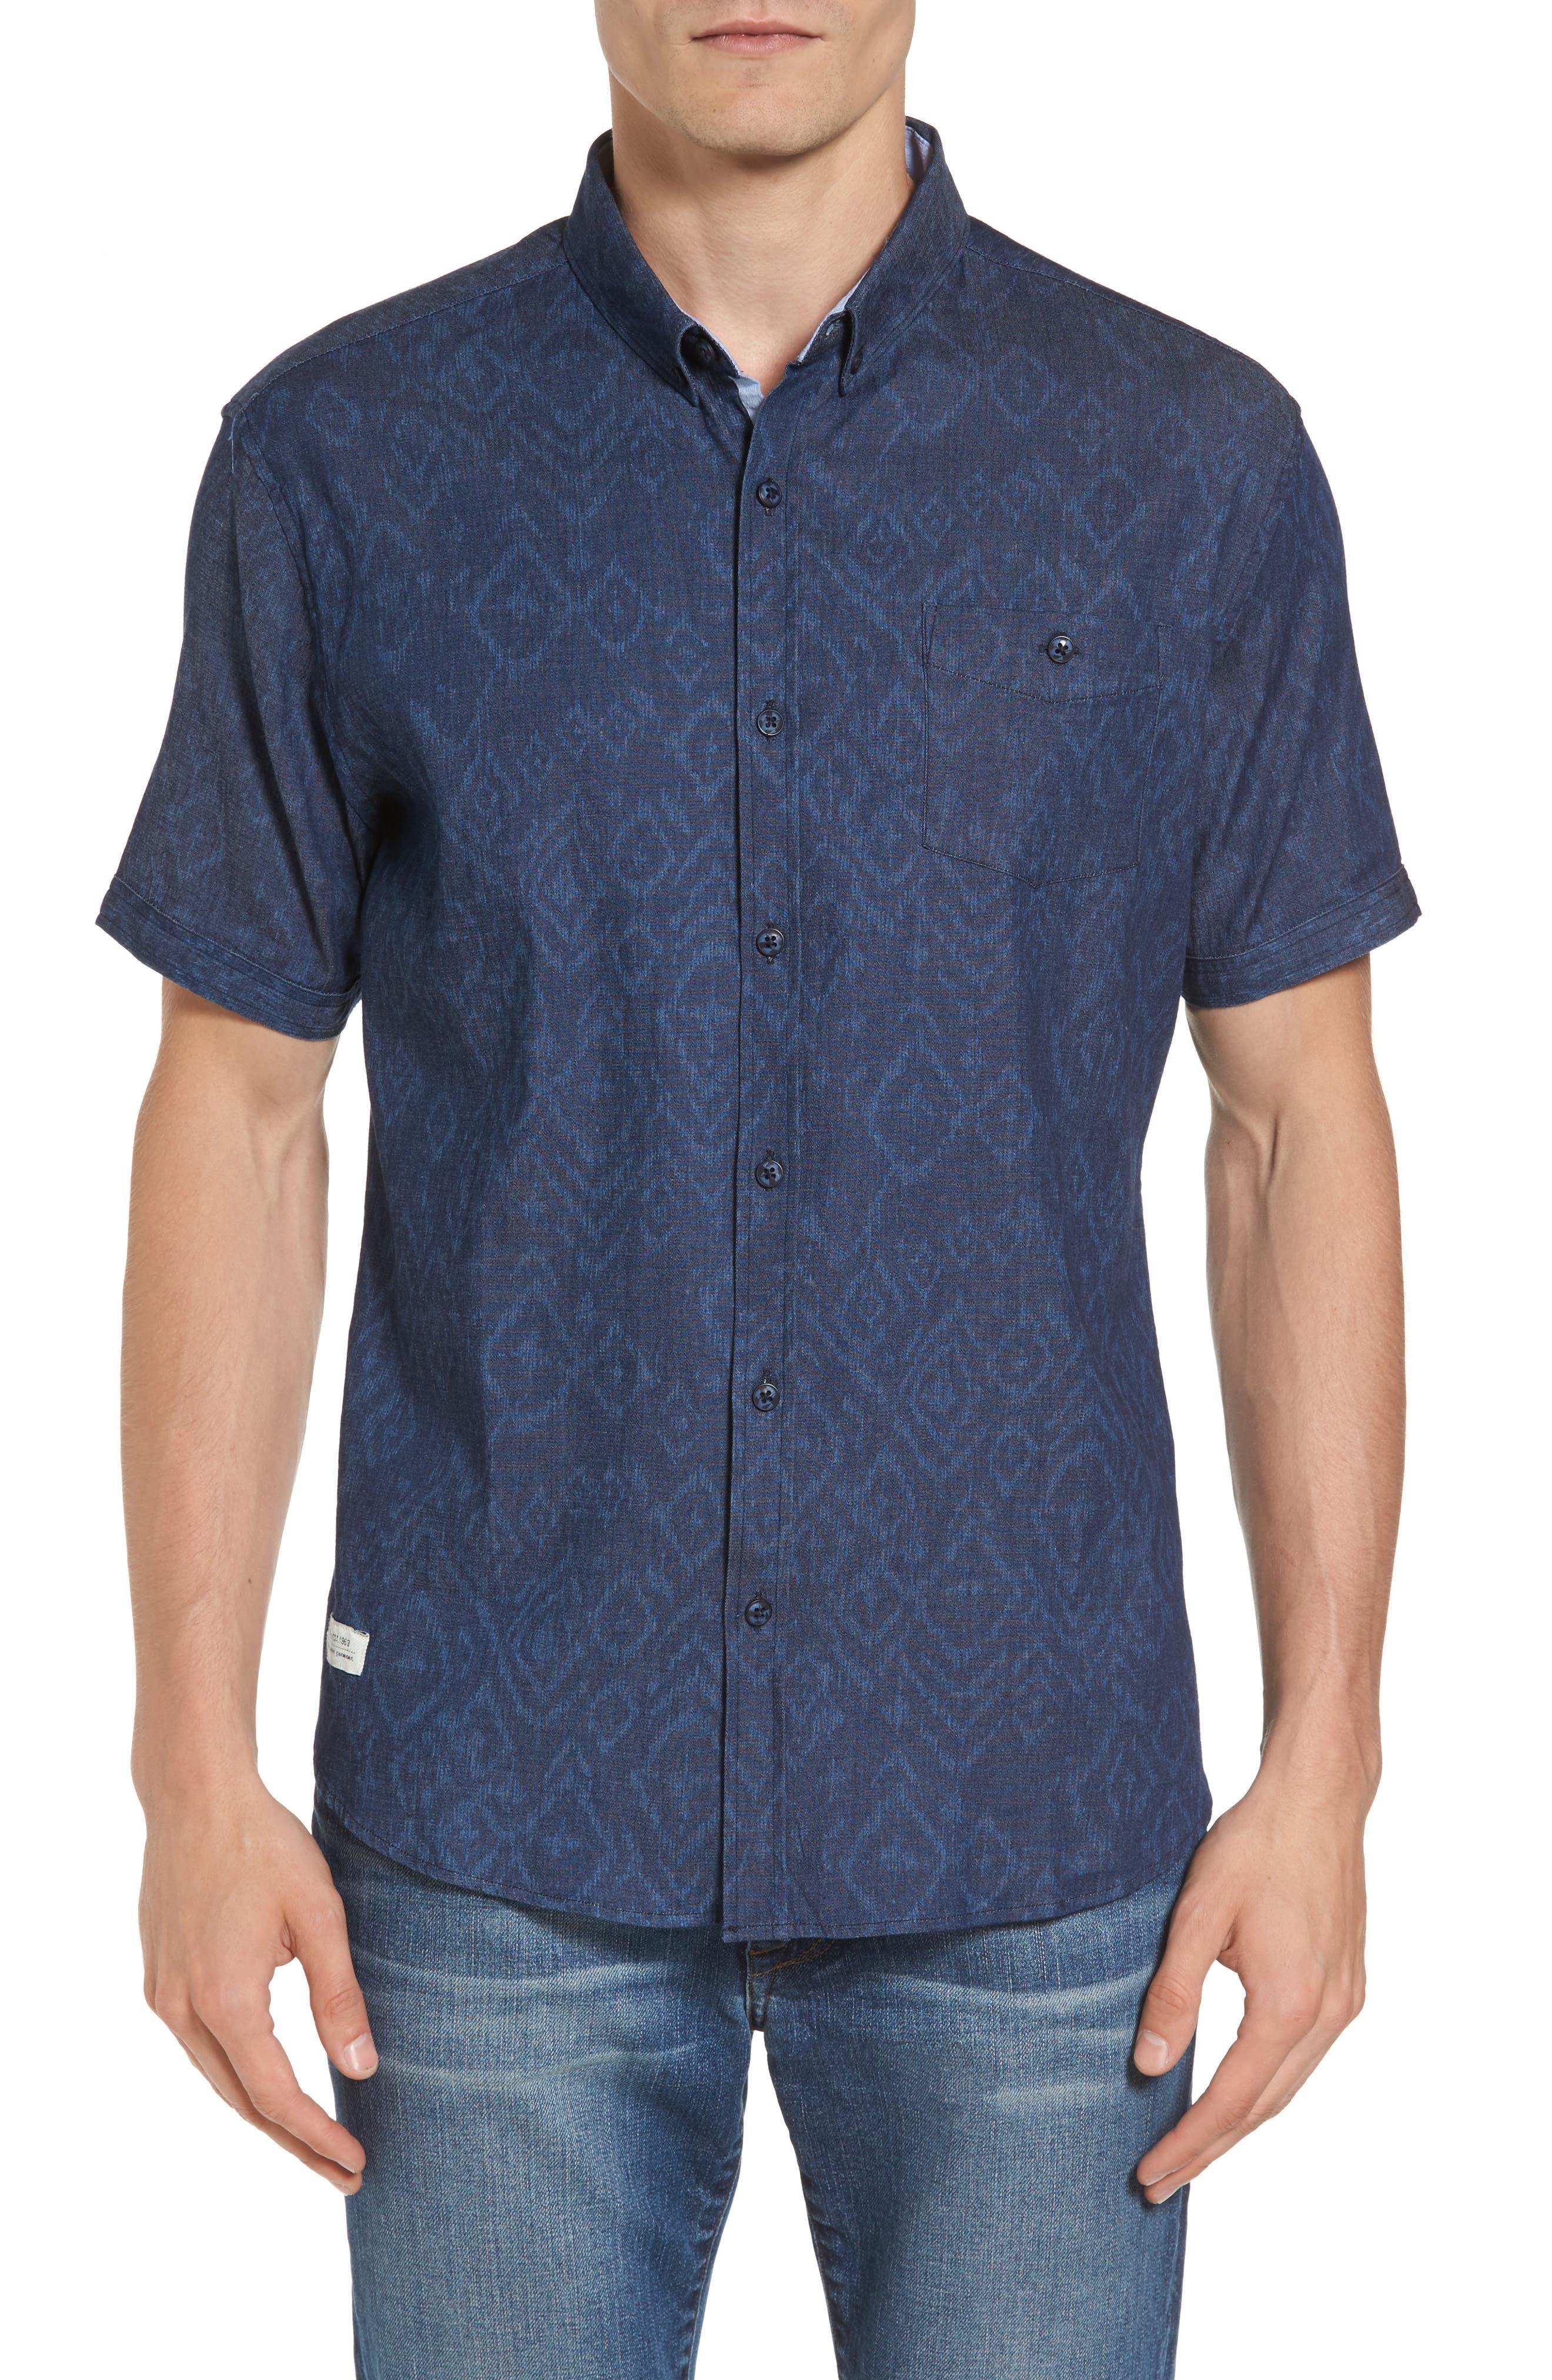 7 DIAMONDS Marquee Moon Print Woven Shirt